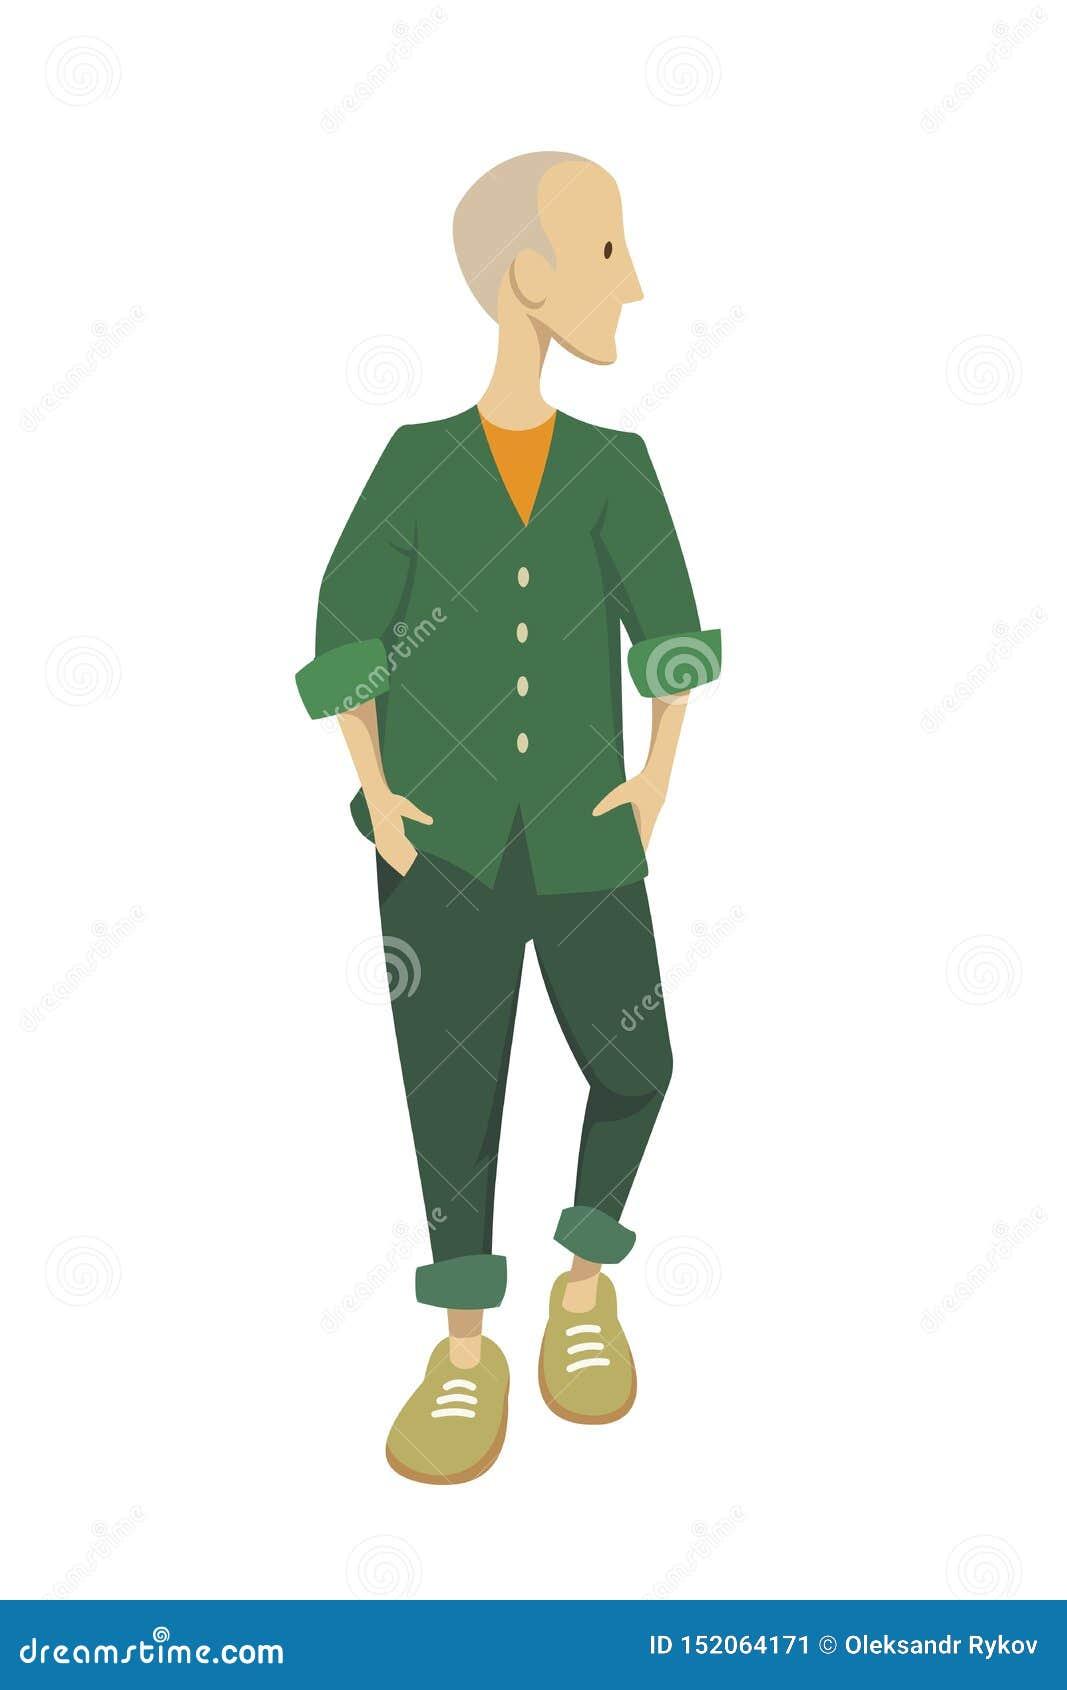 Un hombre joven en una chaqueta verde